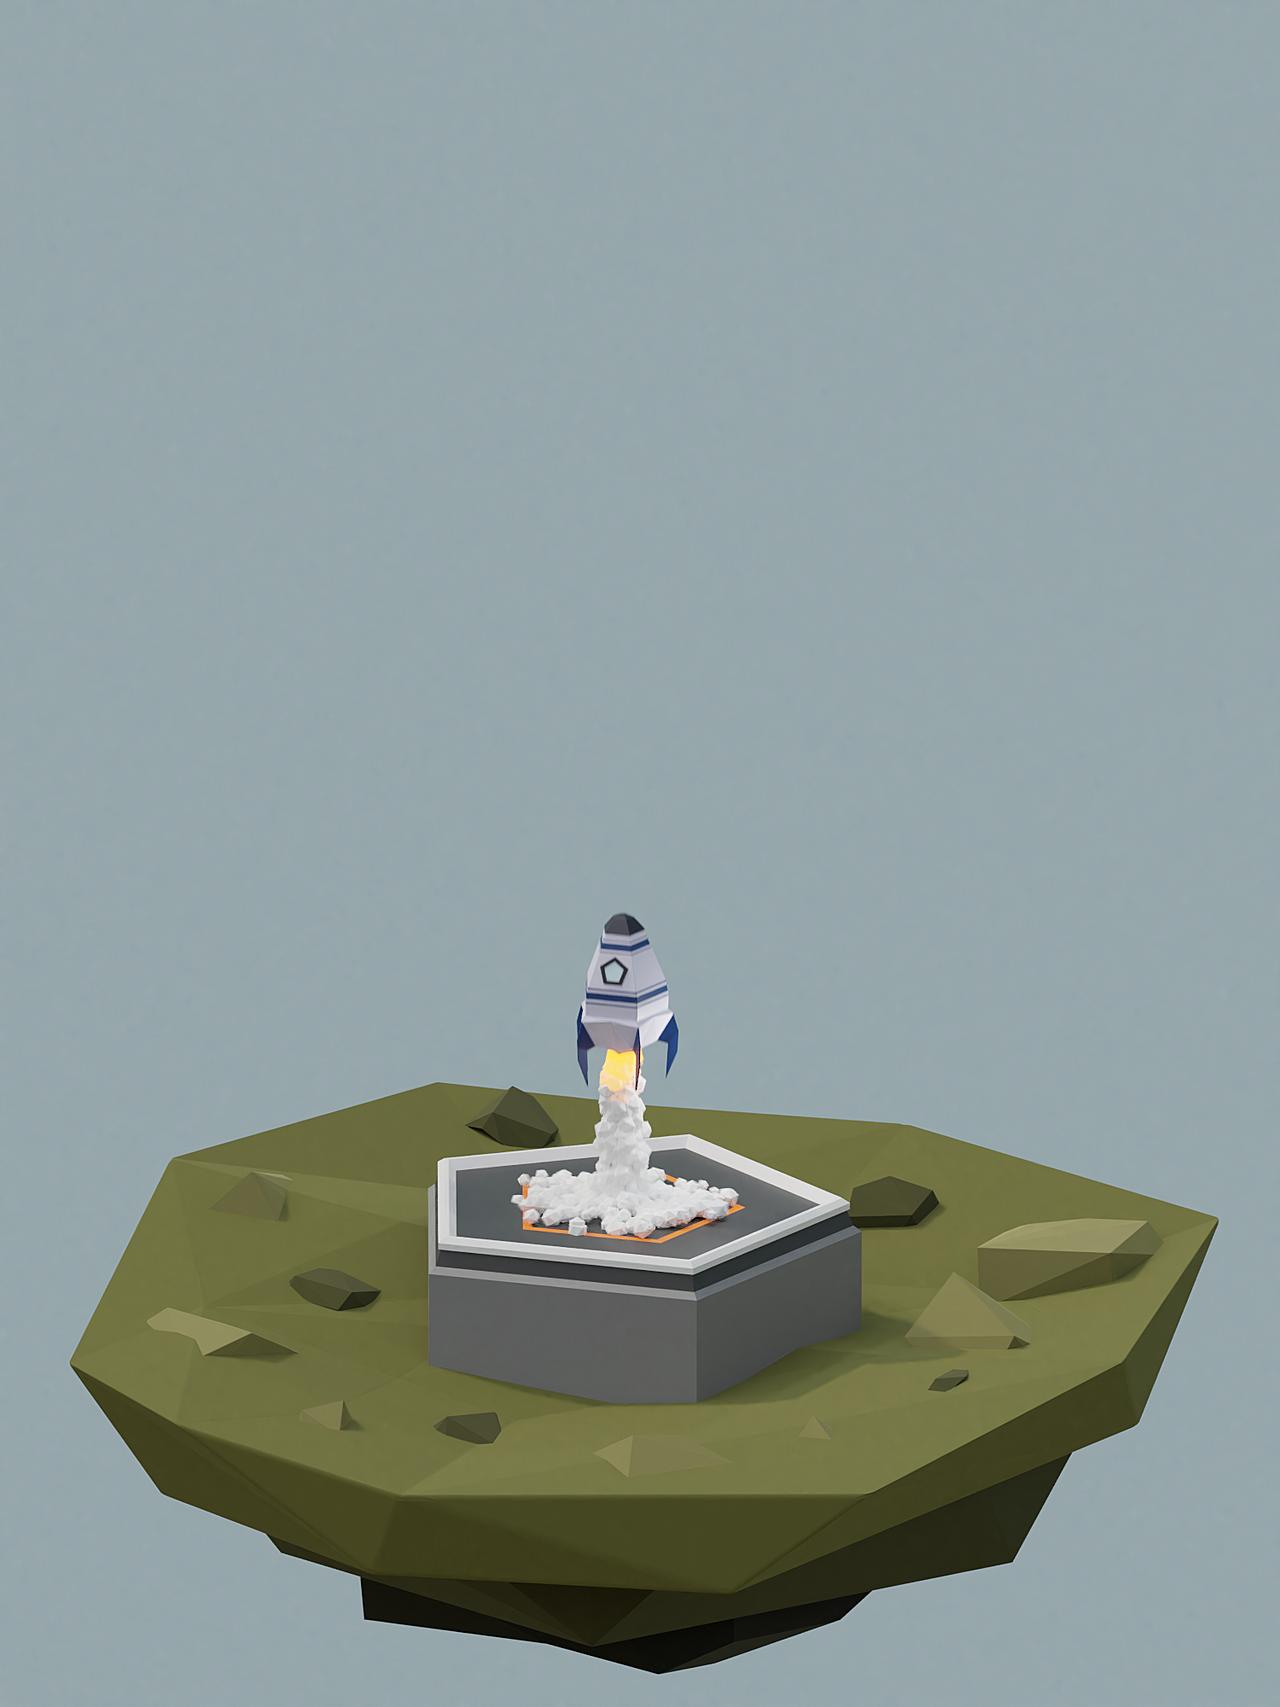 Rocket Launch Animation